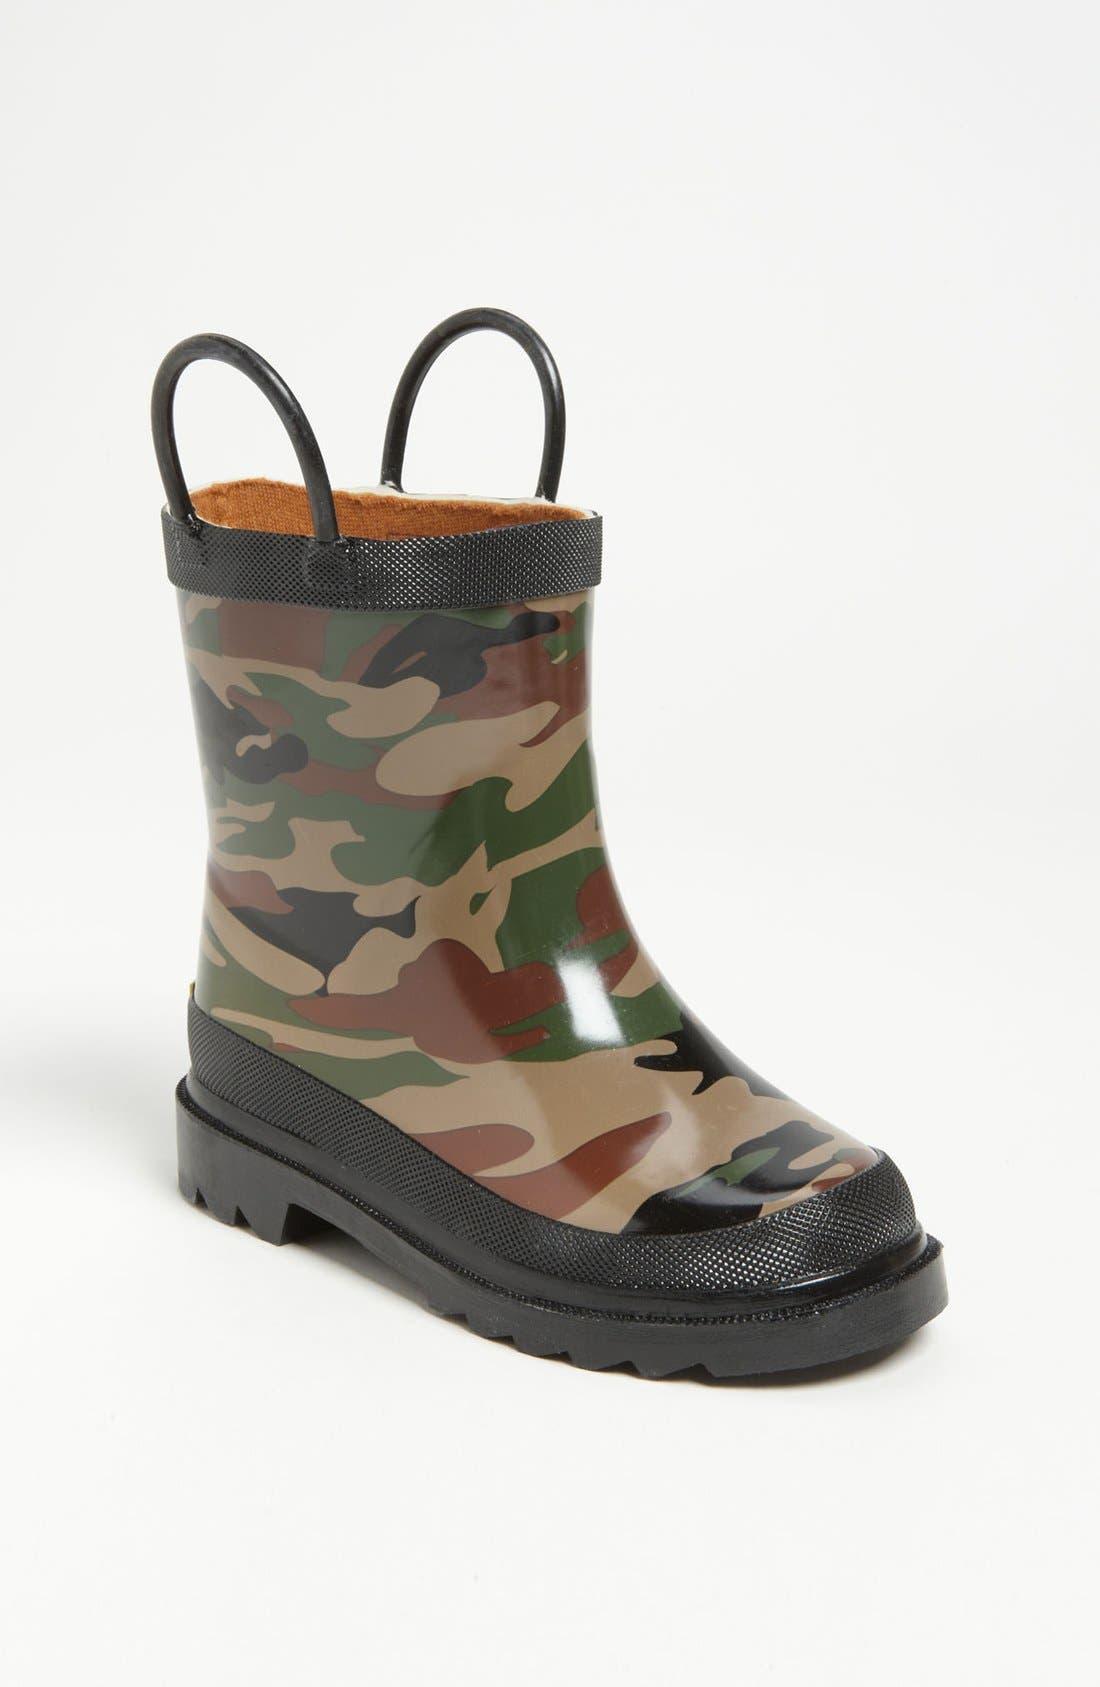 WESTERN CHIEF Camo Waterproof Rain Boot, Main, color, CAMO